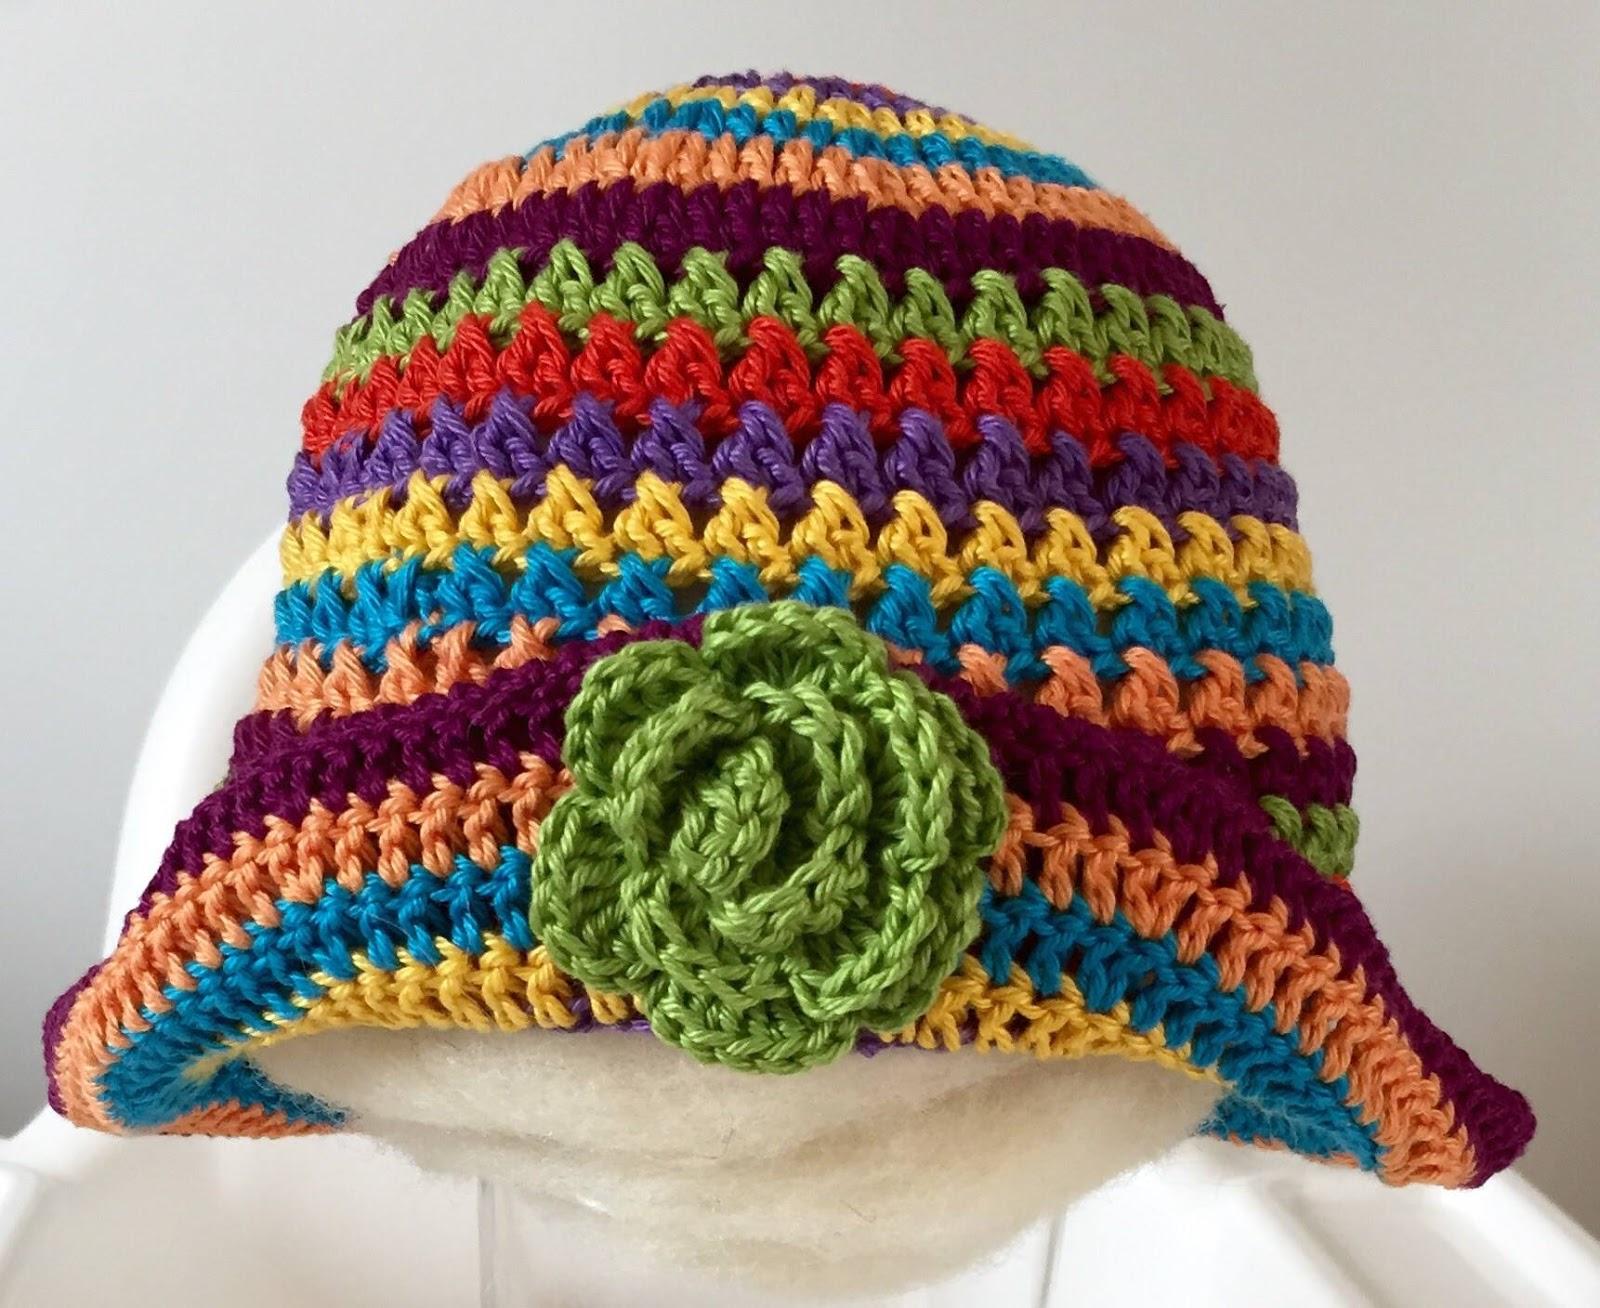 Colorful Häkeln Crown Muster Motif - Decke Stricken Muster ...